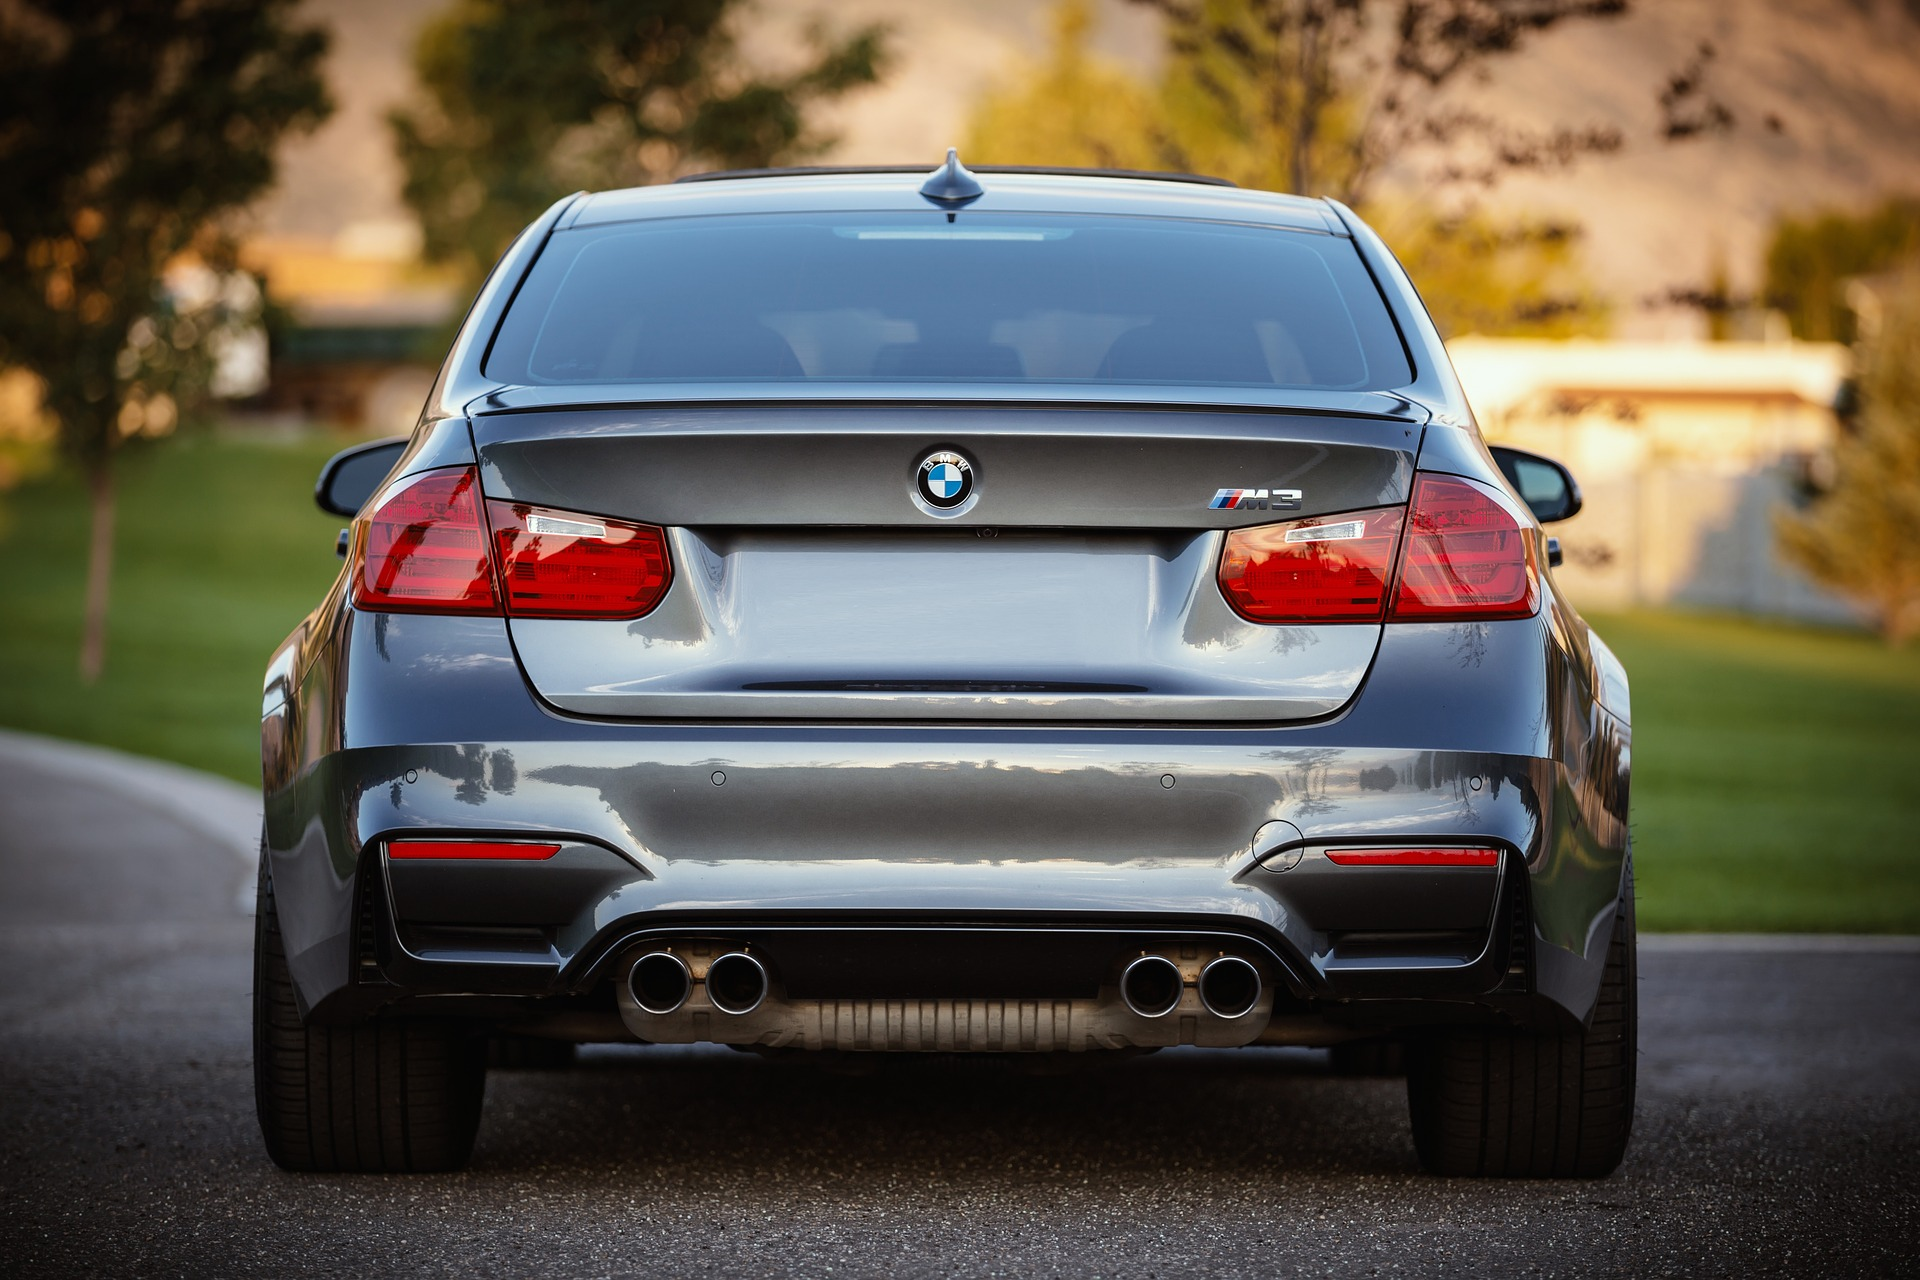 agence automobilière Bye Buy Car